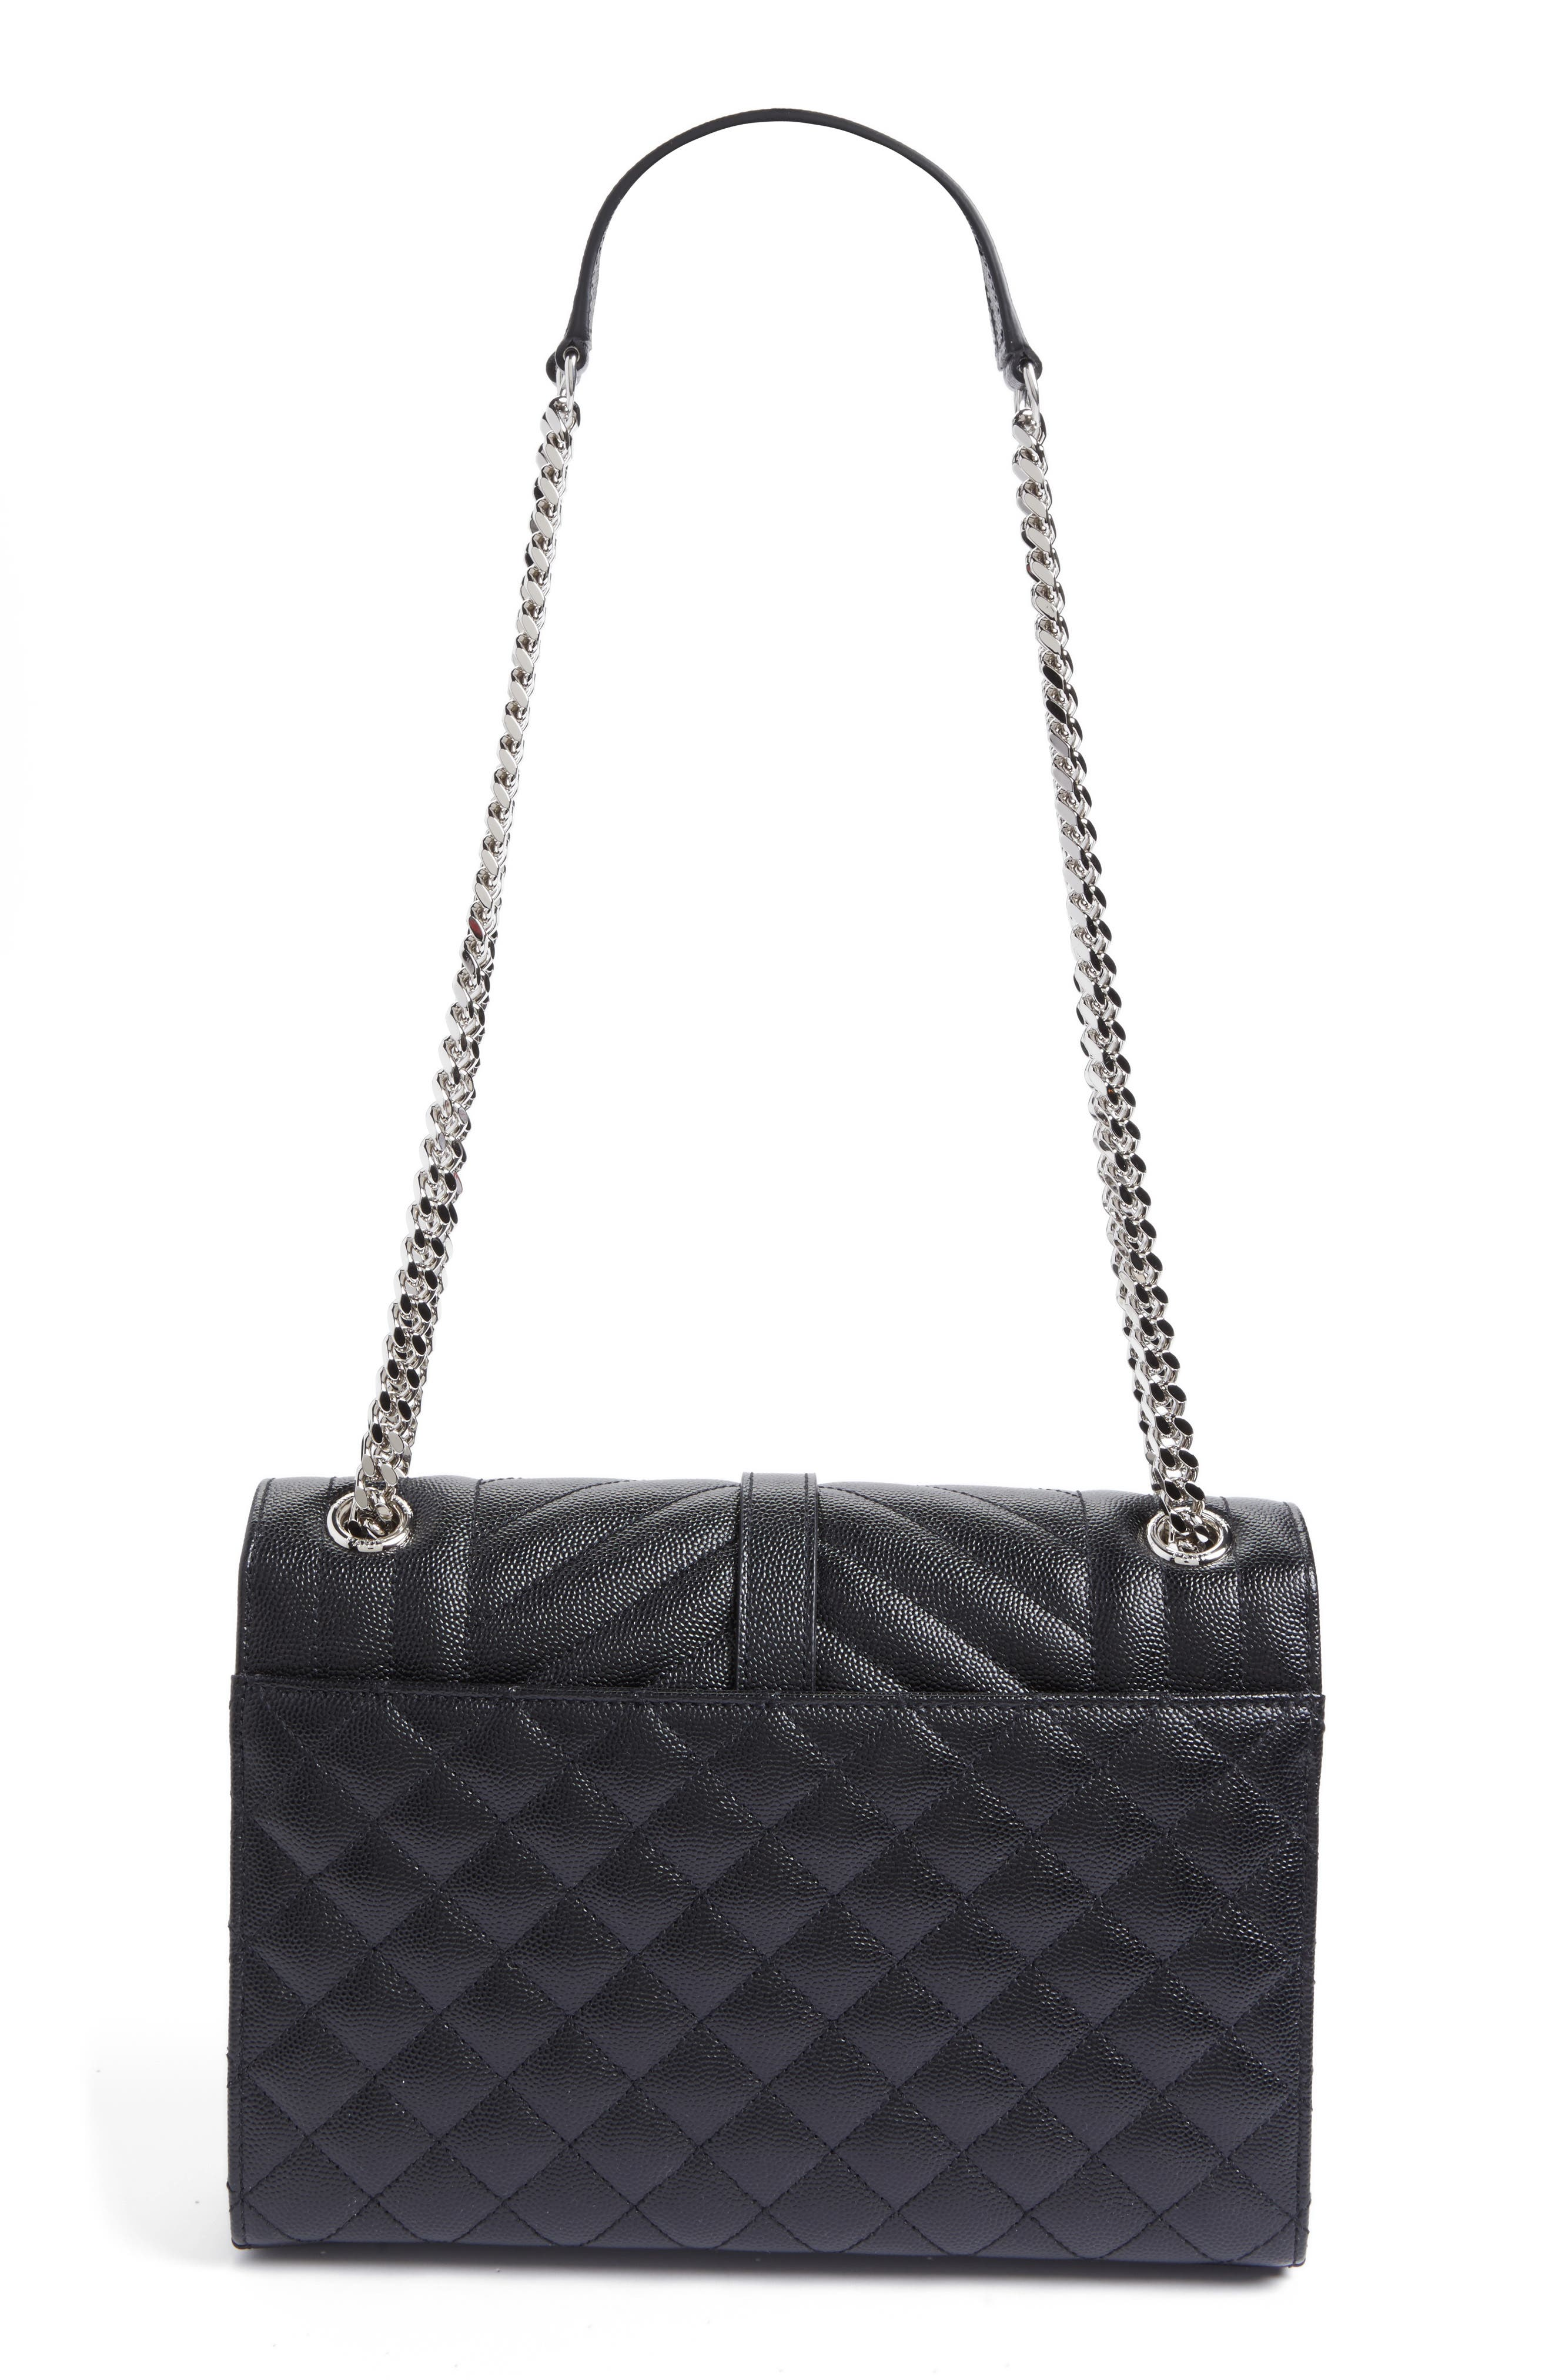 Alternate Image 3  - Saint Laurent Medium Monogram Quilted Leather Shoulder Bag